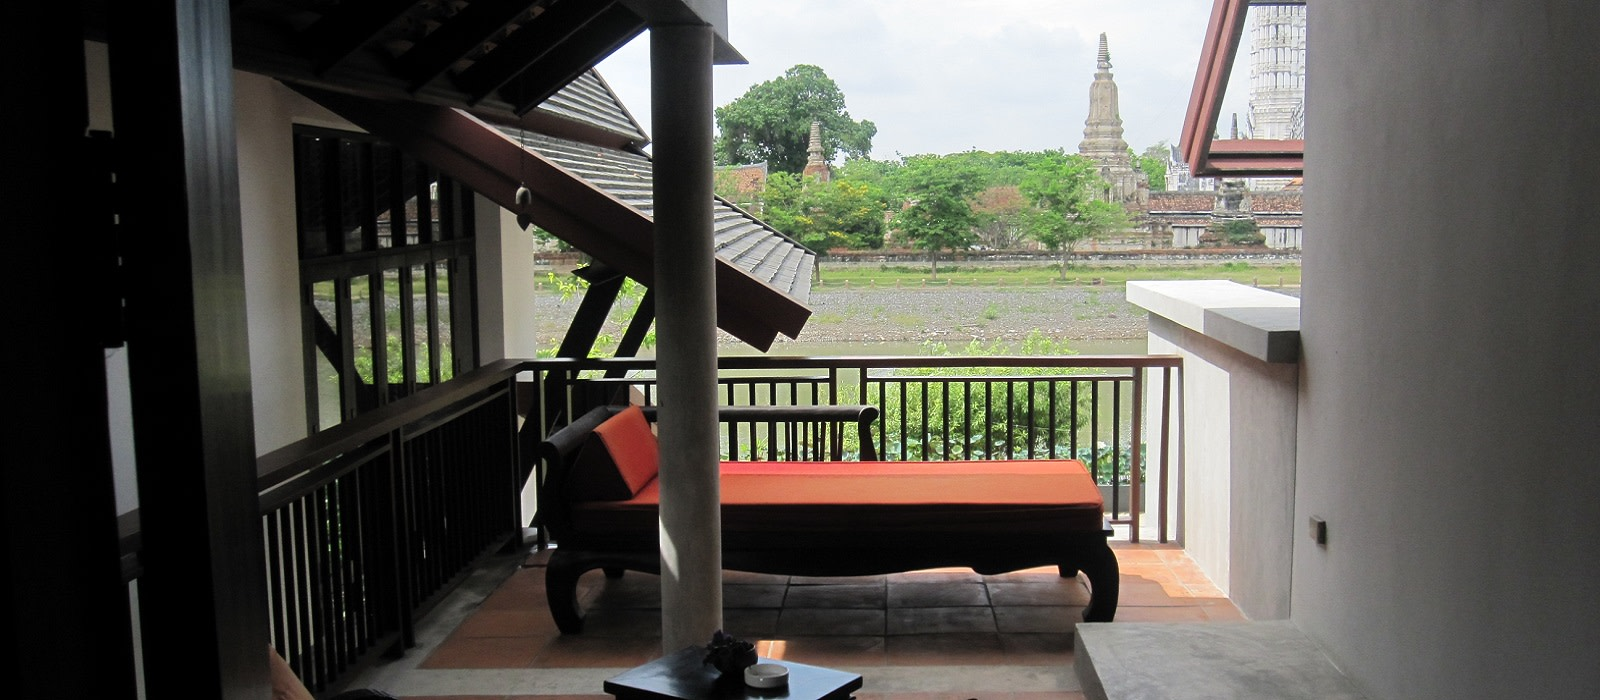 Hotel Iudia on the River Thailand